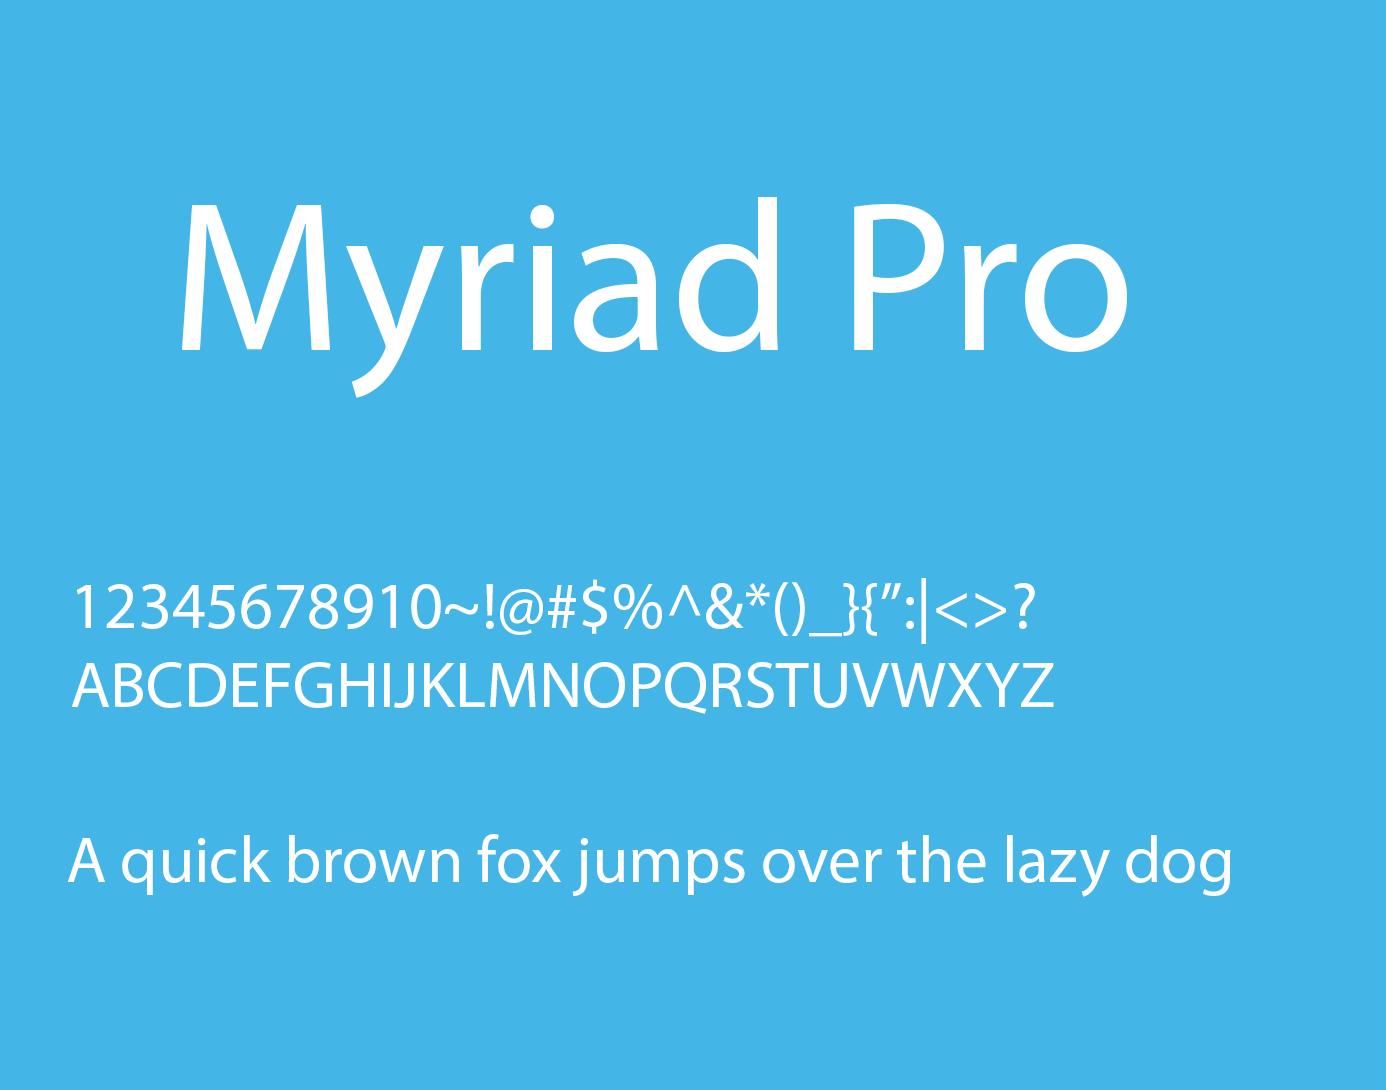 Myriad Pro Font Free Download - Free Fonts   Sans Serif Fonts   Free